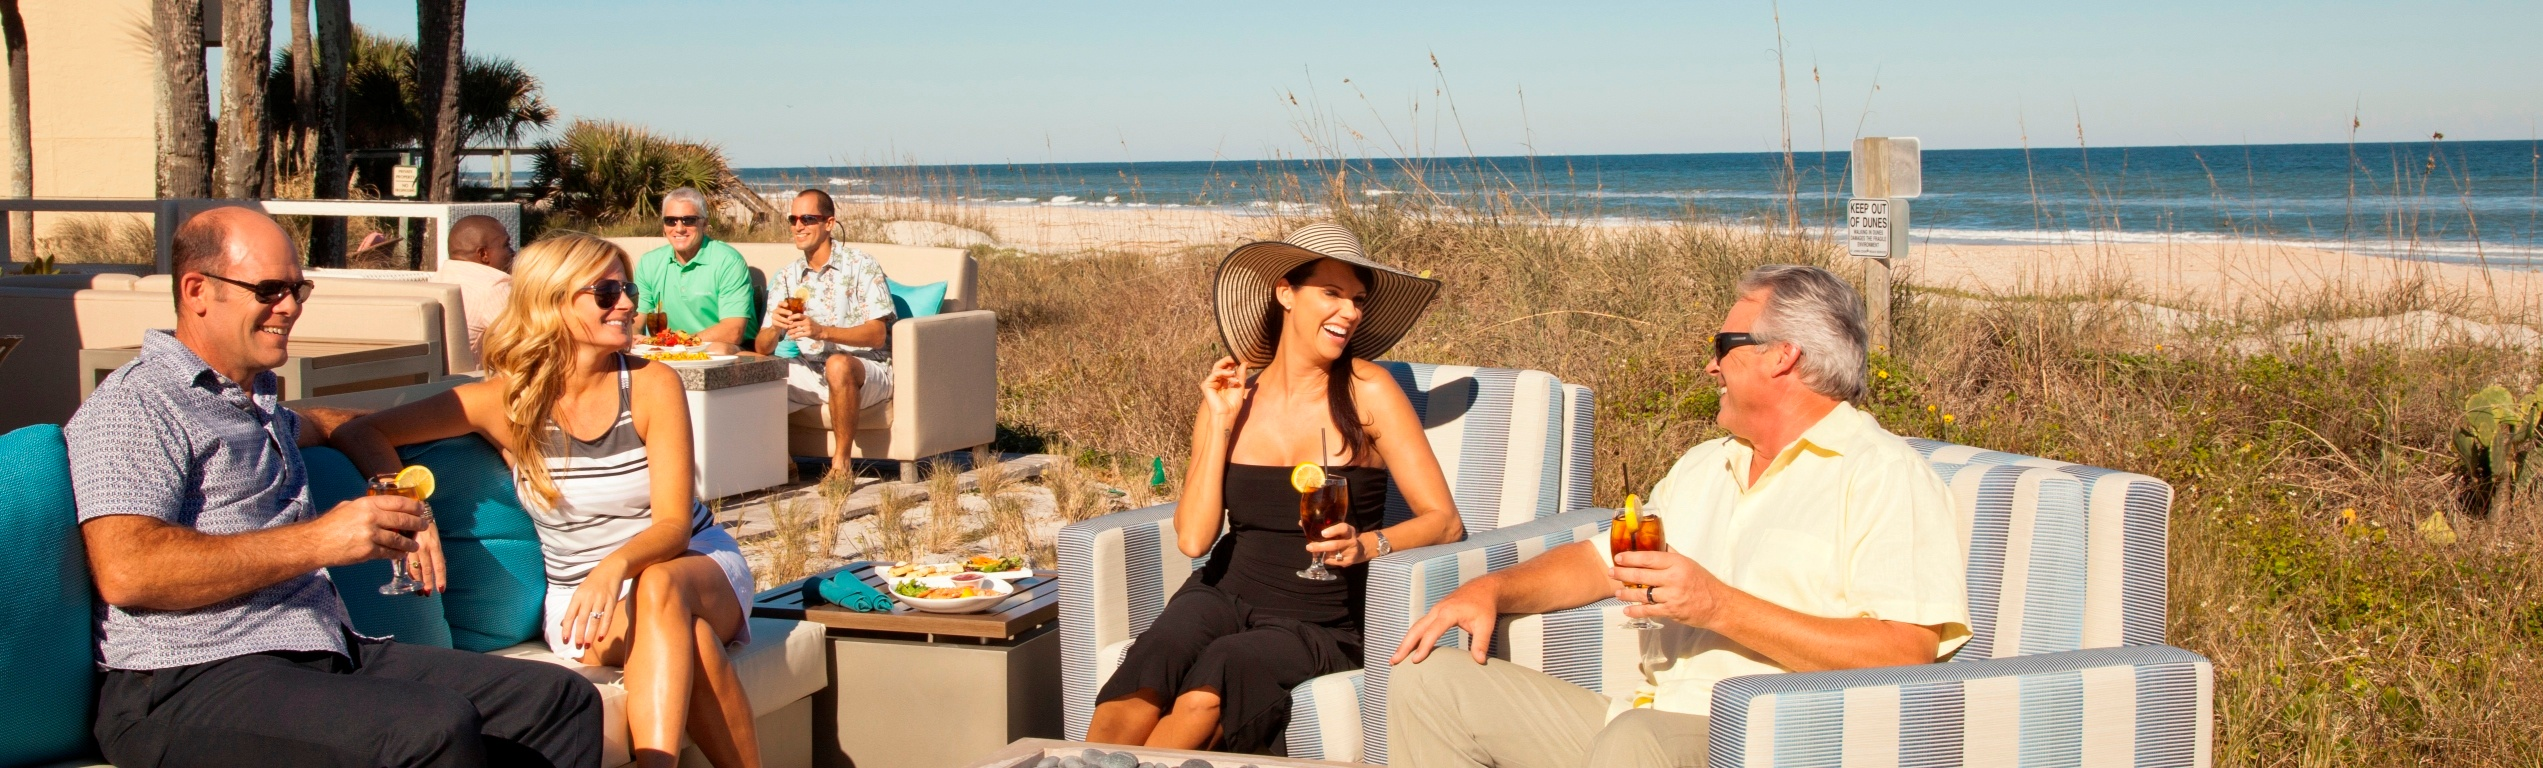 Cabana Beach Club Dining in Ponte Vedra Beach